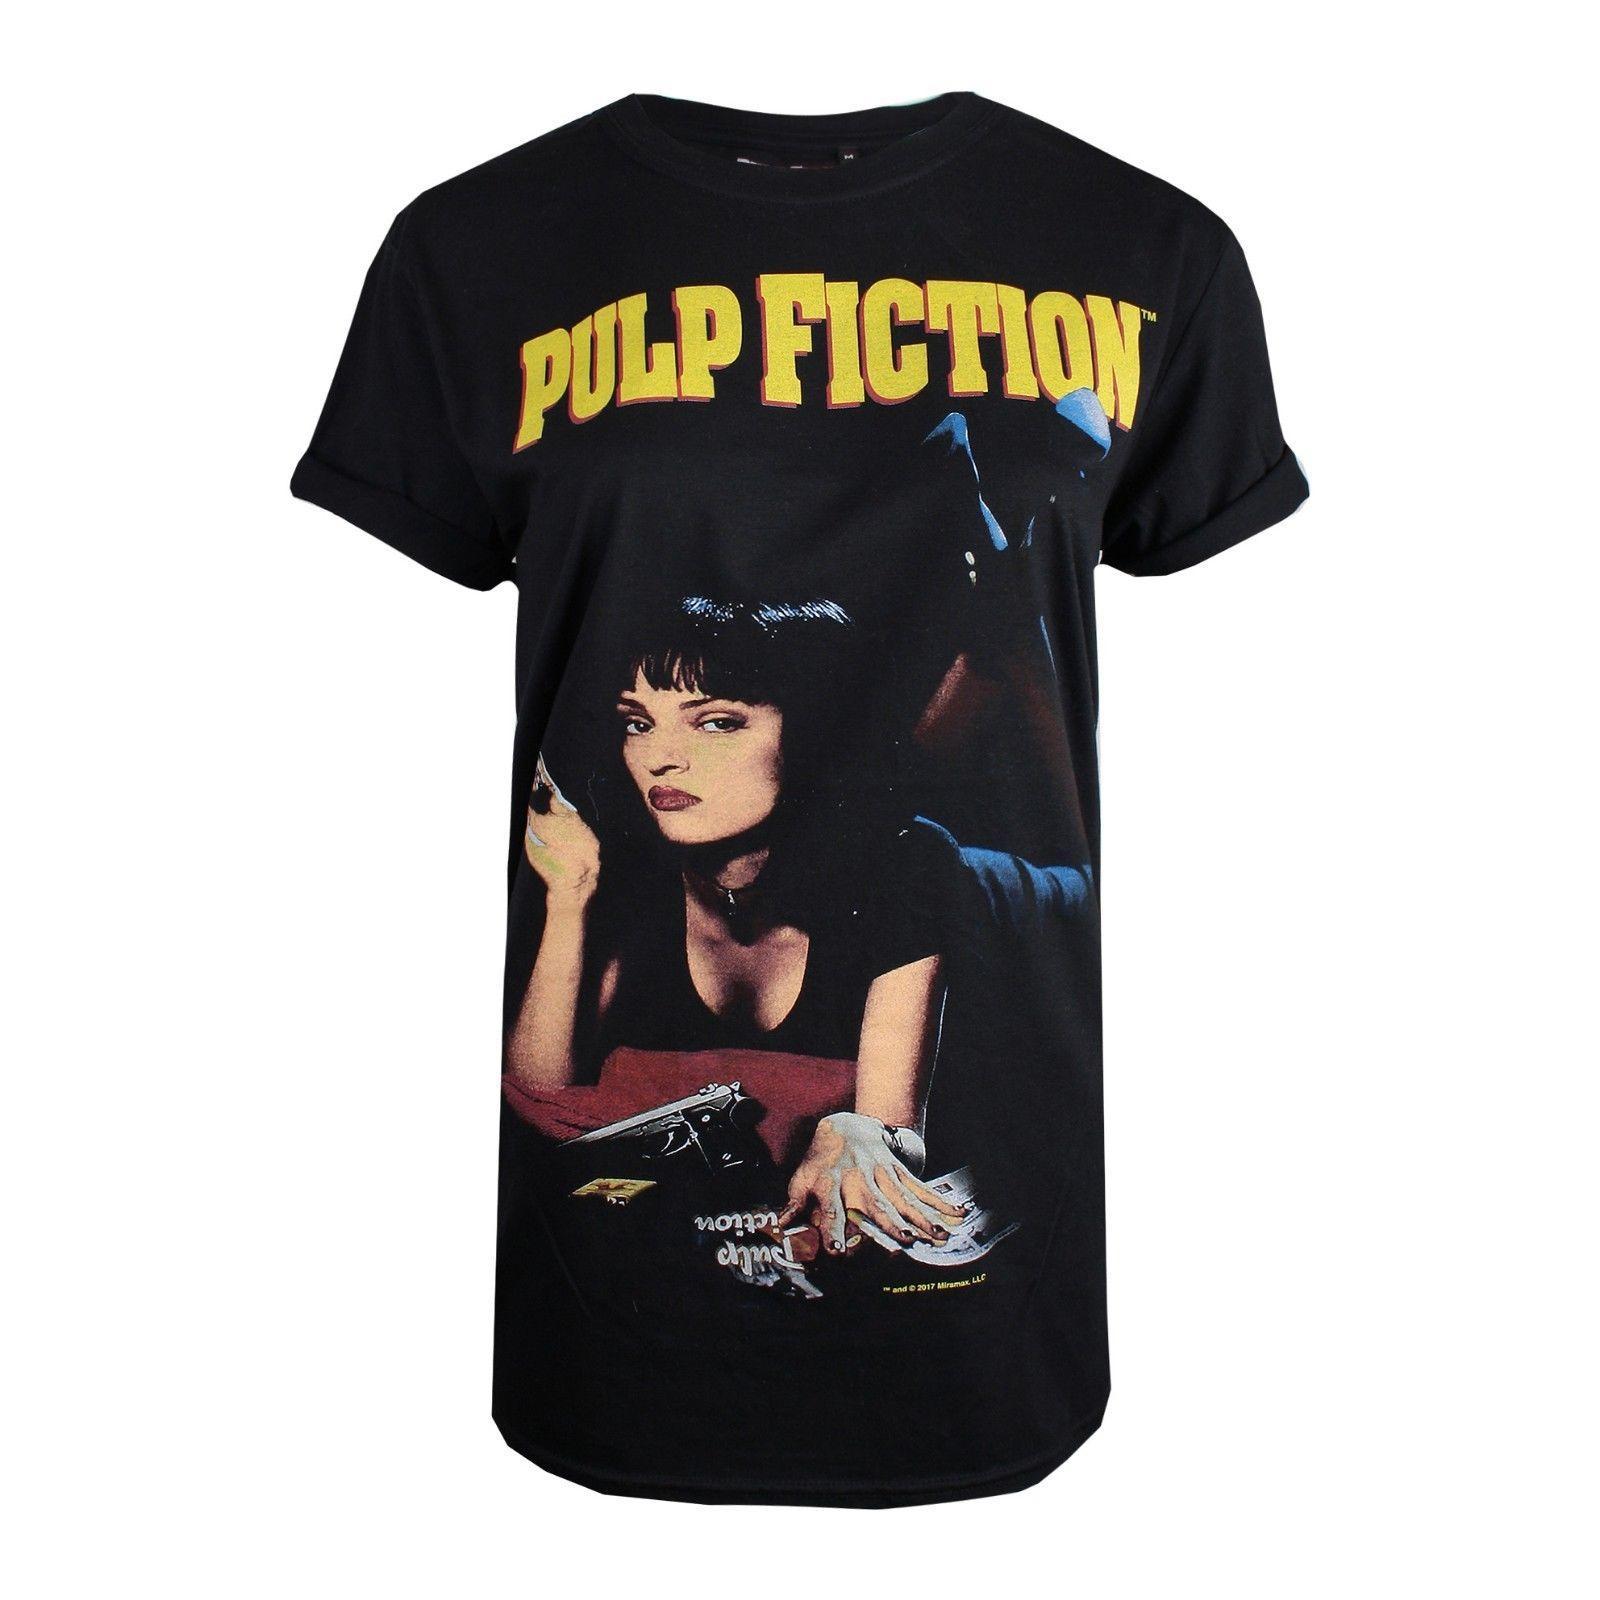 Camiseta Mia Compre Fiction Para Uma Pulp Mujer Thurman zR41Xq